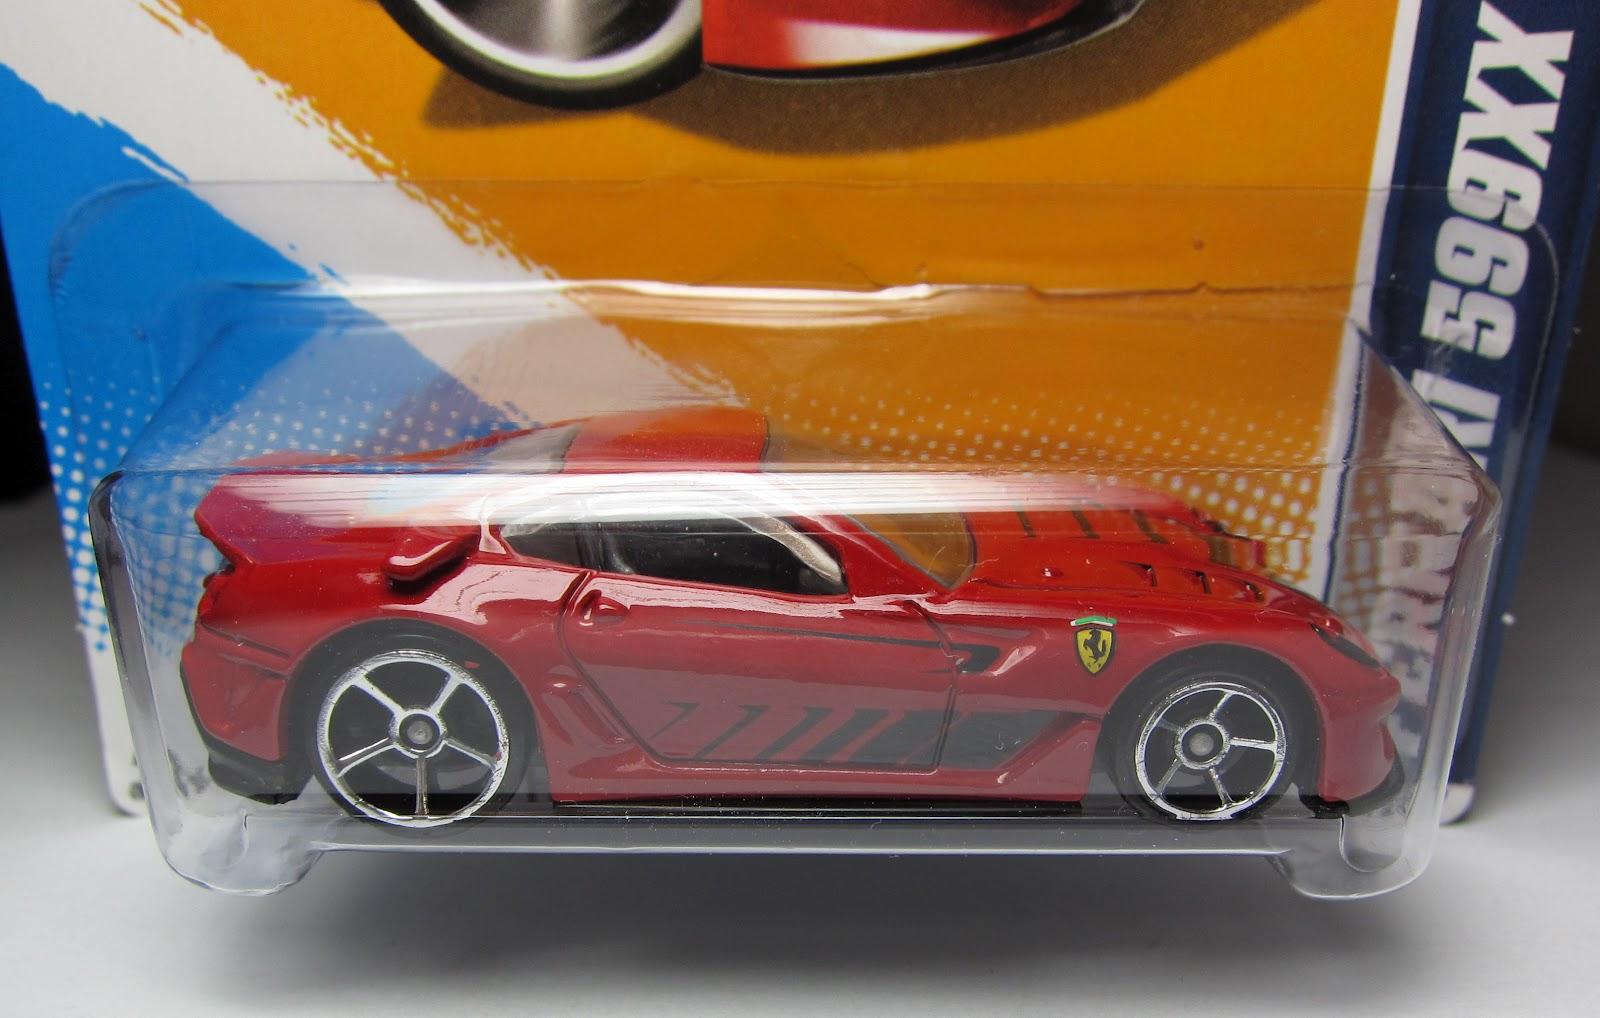 variation alert hot wheels ferrari 599xx with oh5 wheels - Rare Hot Wheels Cars 2012